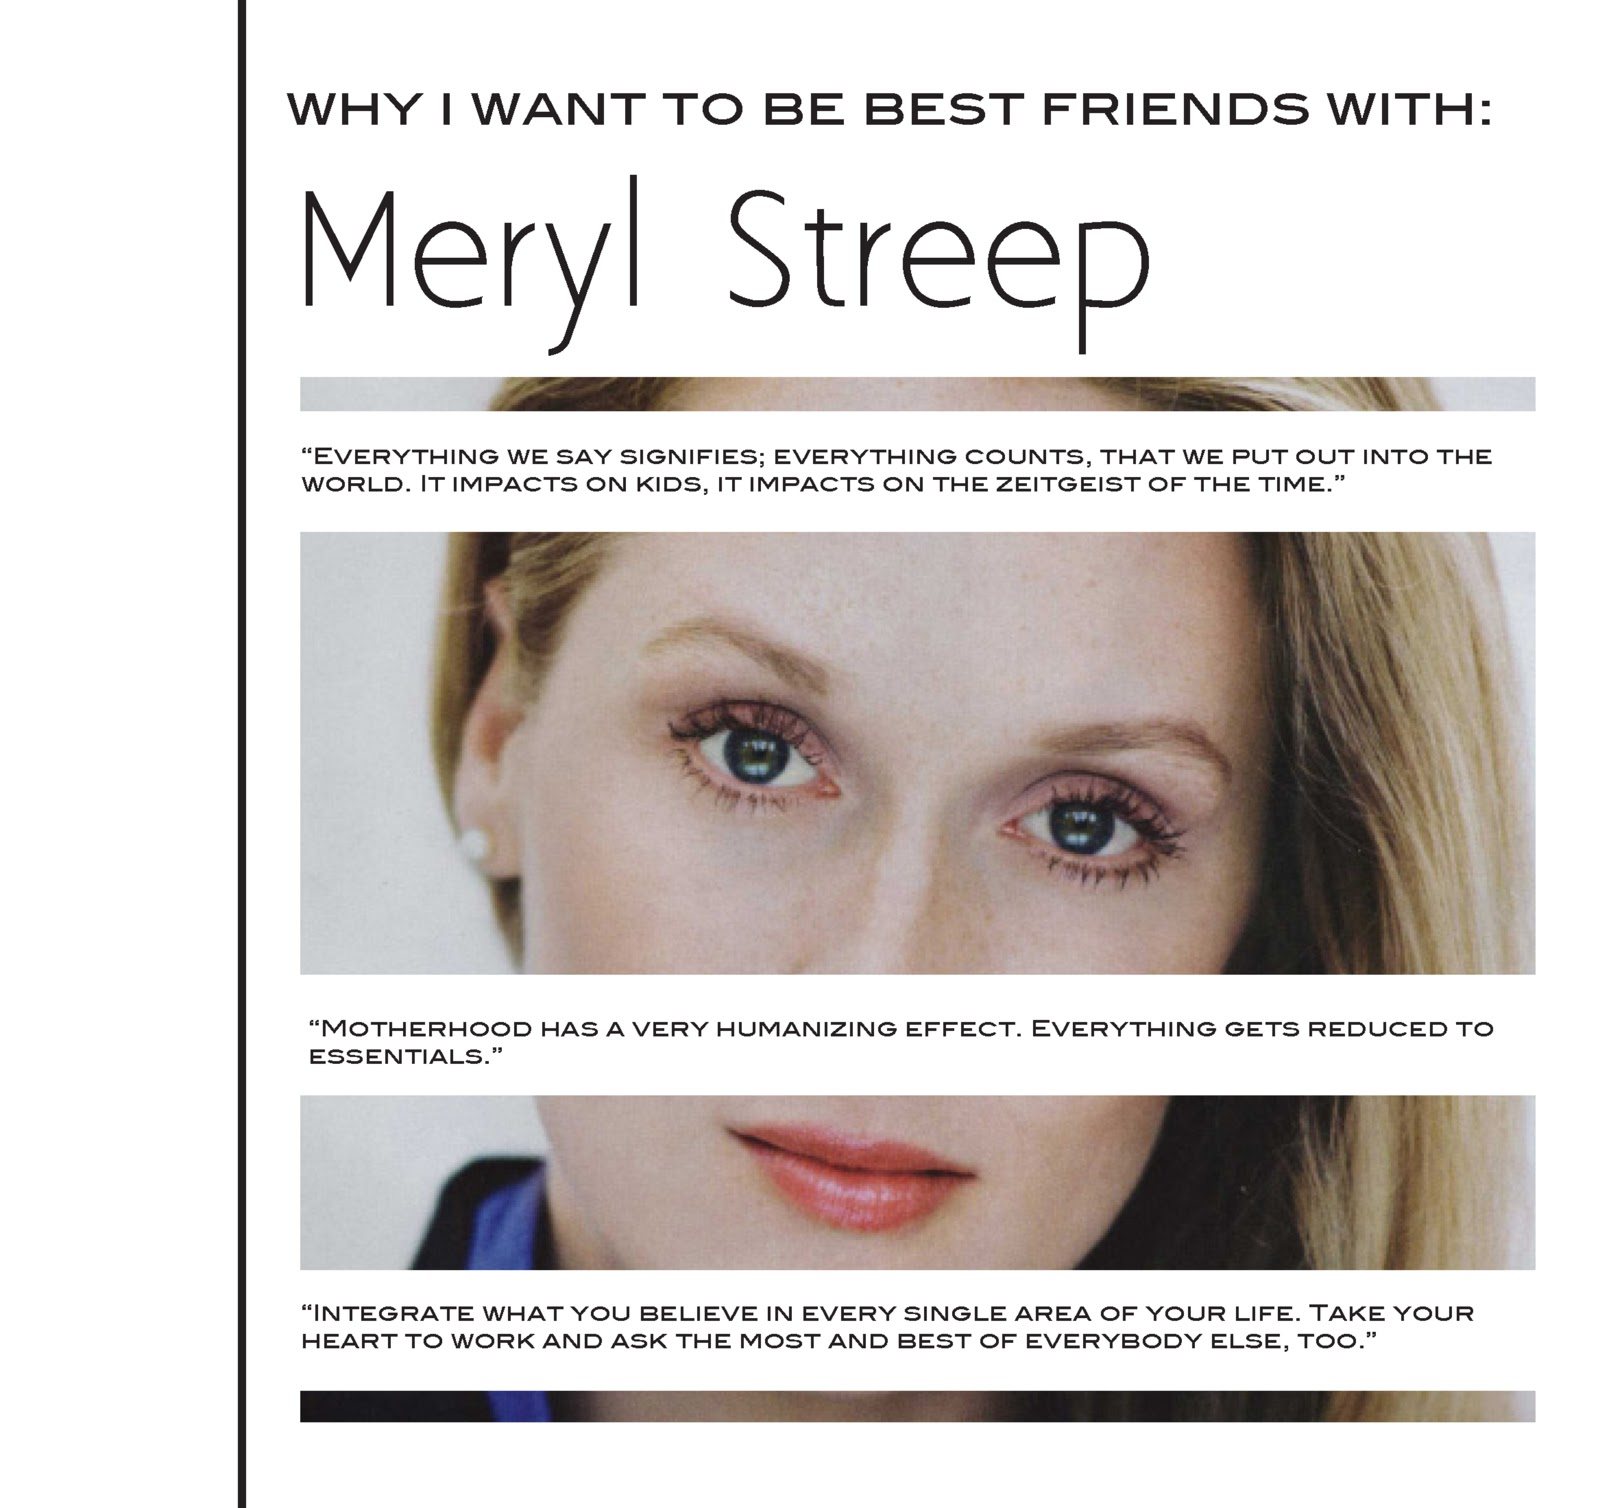 http://3.bp.blogspot.com/-y83919ov7FI/ULL7It5b1UI/AAAAAAAADiw/p3mvdjG4oc8/s1600/Meryl+Streep.tiff